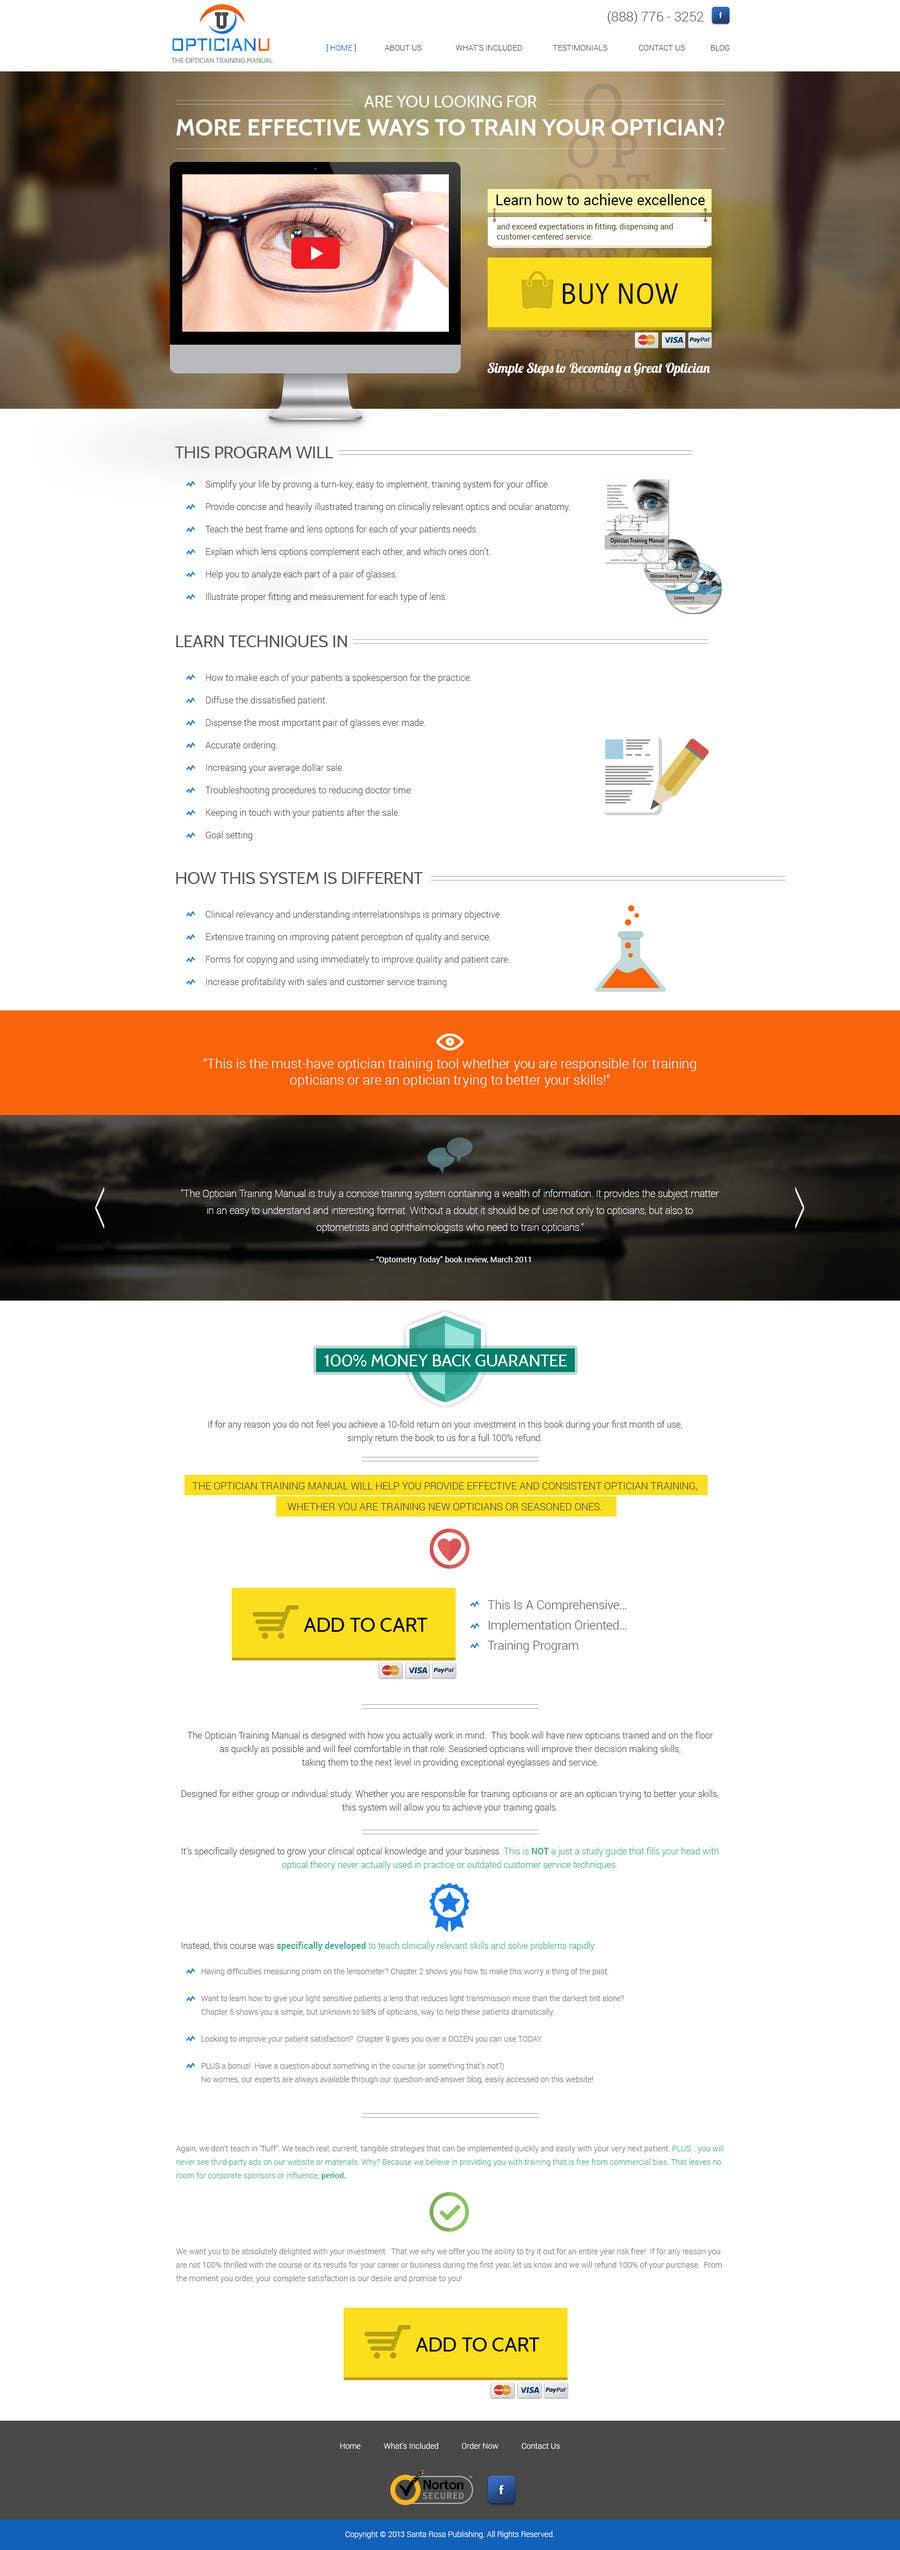 #11 for Design a Website Mockup for www.OpticianTraining.com by thecwstudio